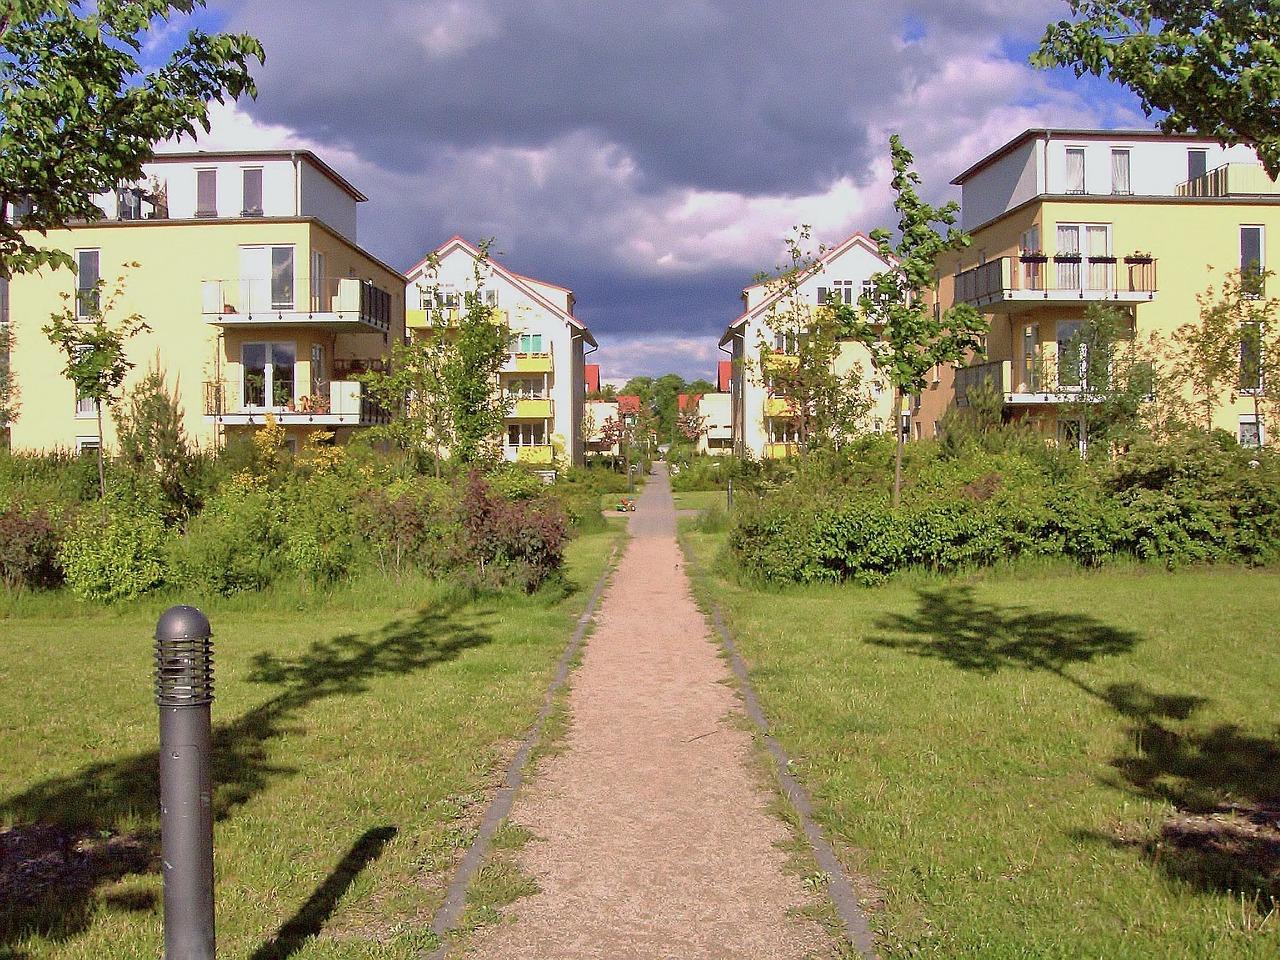 residential-complex-660901_1280.jpg